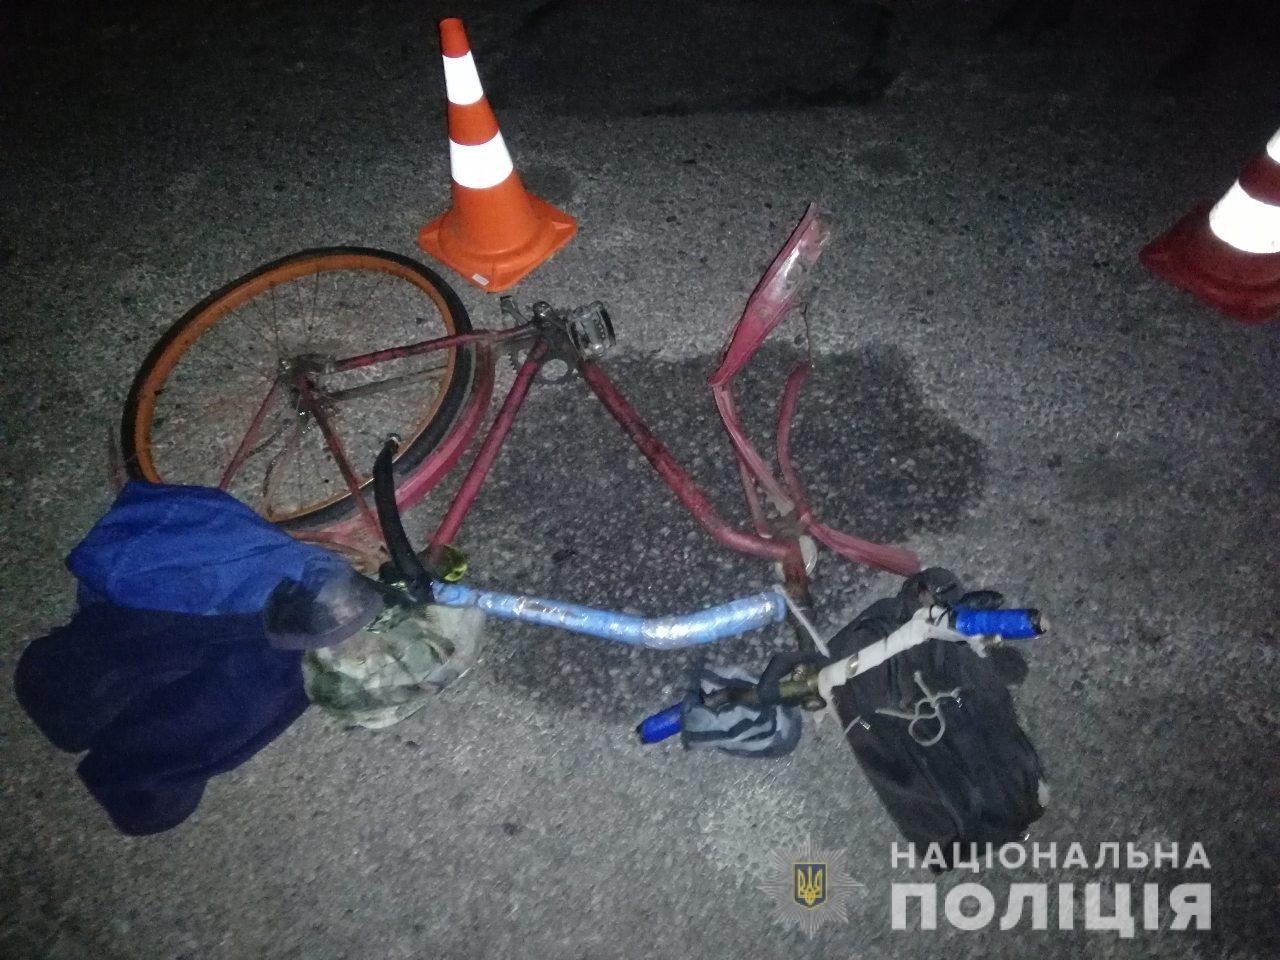 На Харьковщине во время ДТП погибли три человека, - ФОТО, фото-5